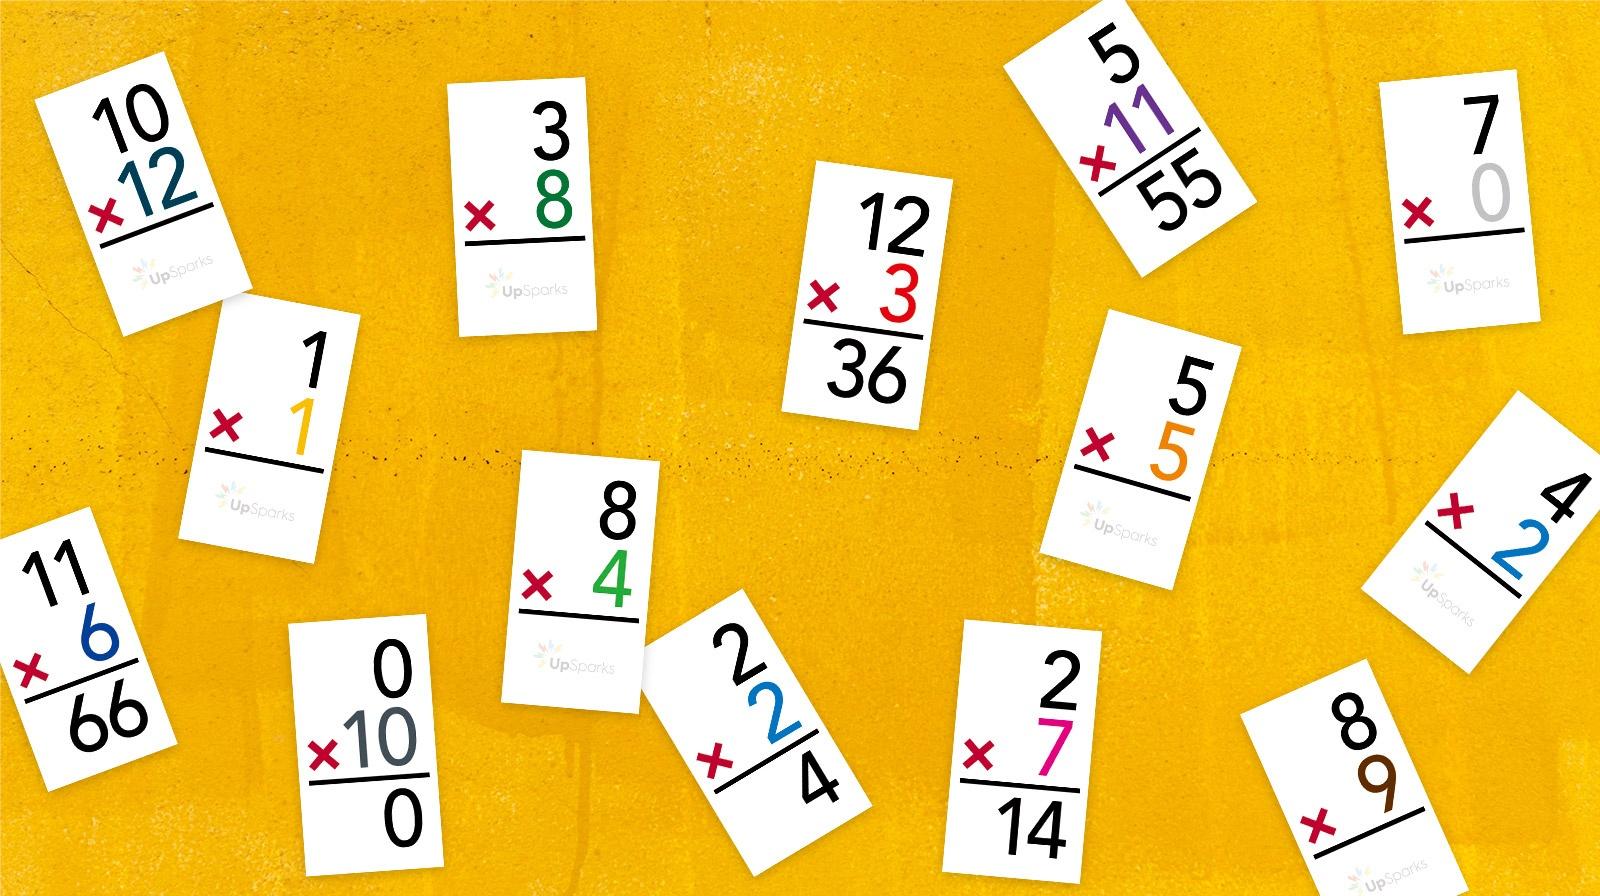 Free Multiplication Flash Cards Printable Sheets From Upsparks - Free Printable Multiplication Flash Cards Pdf